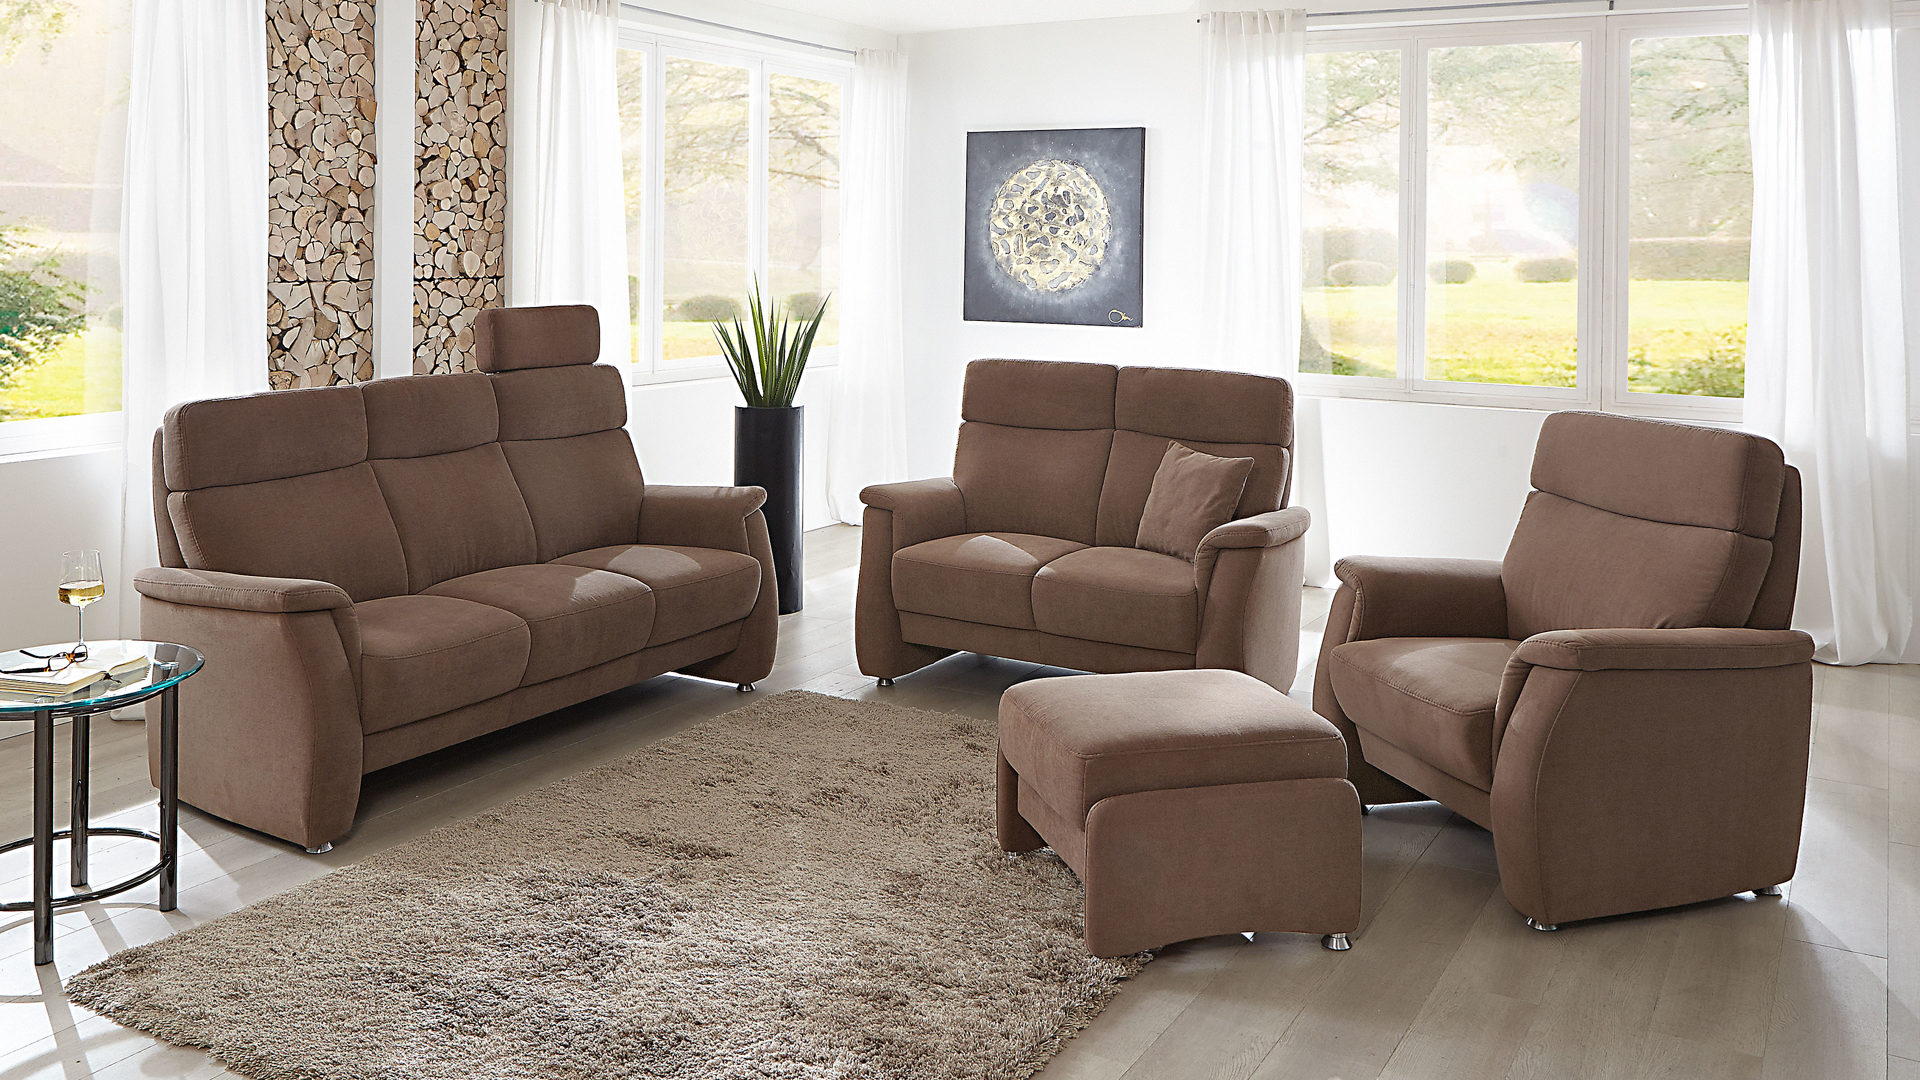 orthoSedis 3-Sitzer und 2-Sitzer, muskatfarbener Clever Clean fresh ...